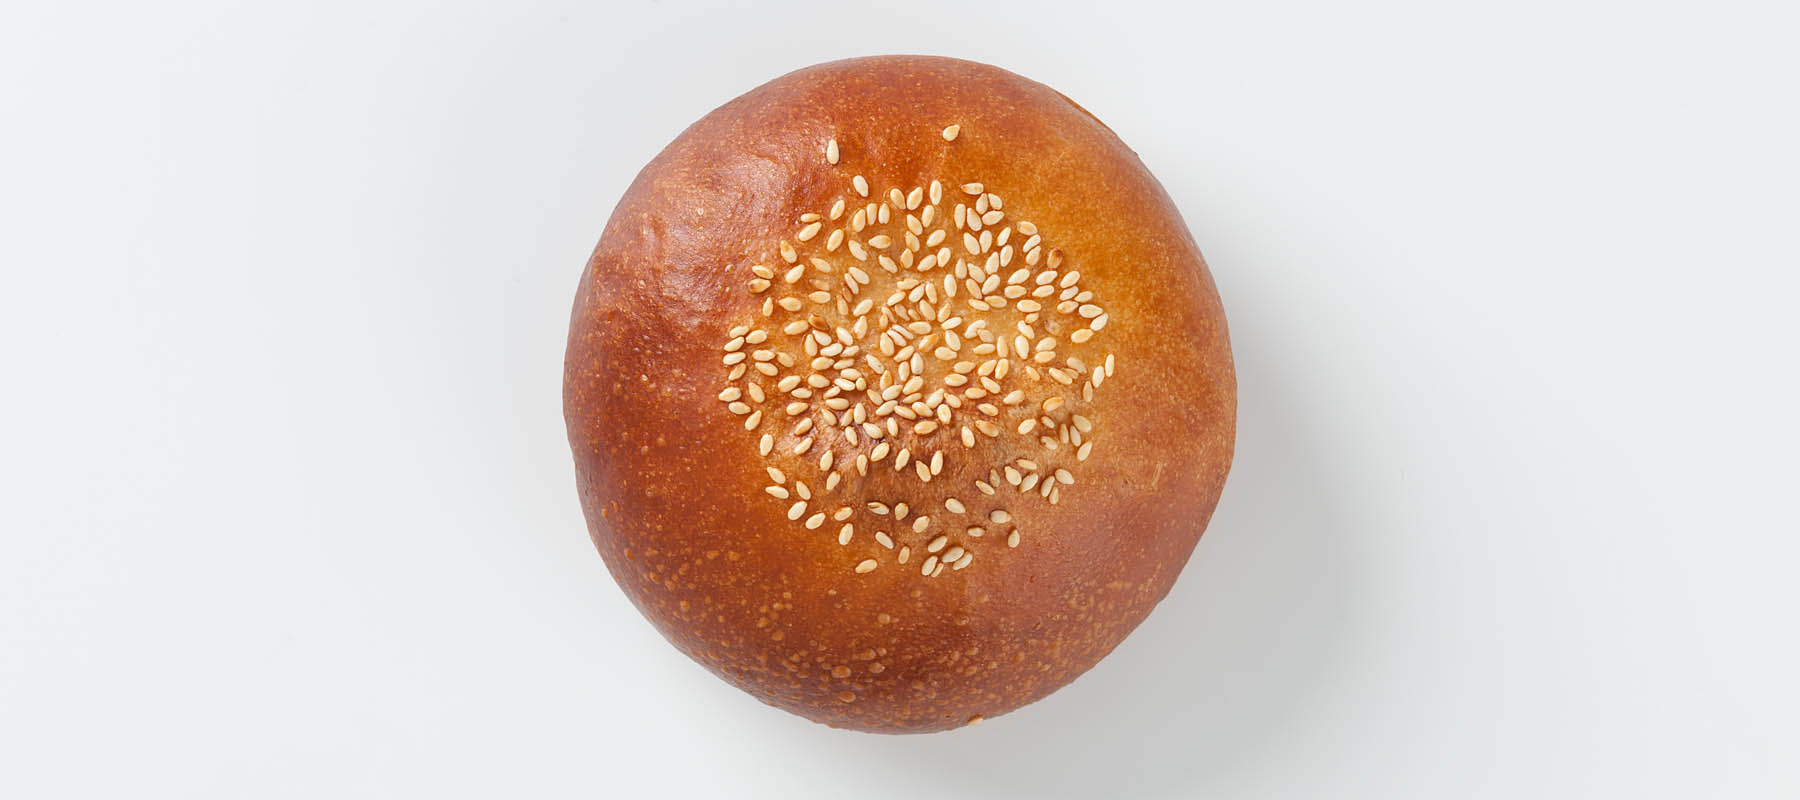 1800x800_Shiro_Anpan_kame_japanese_bakery_1